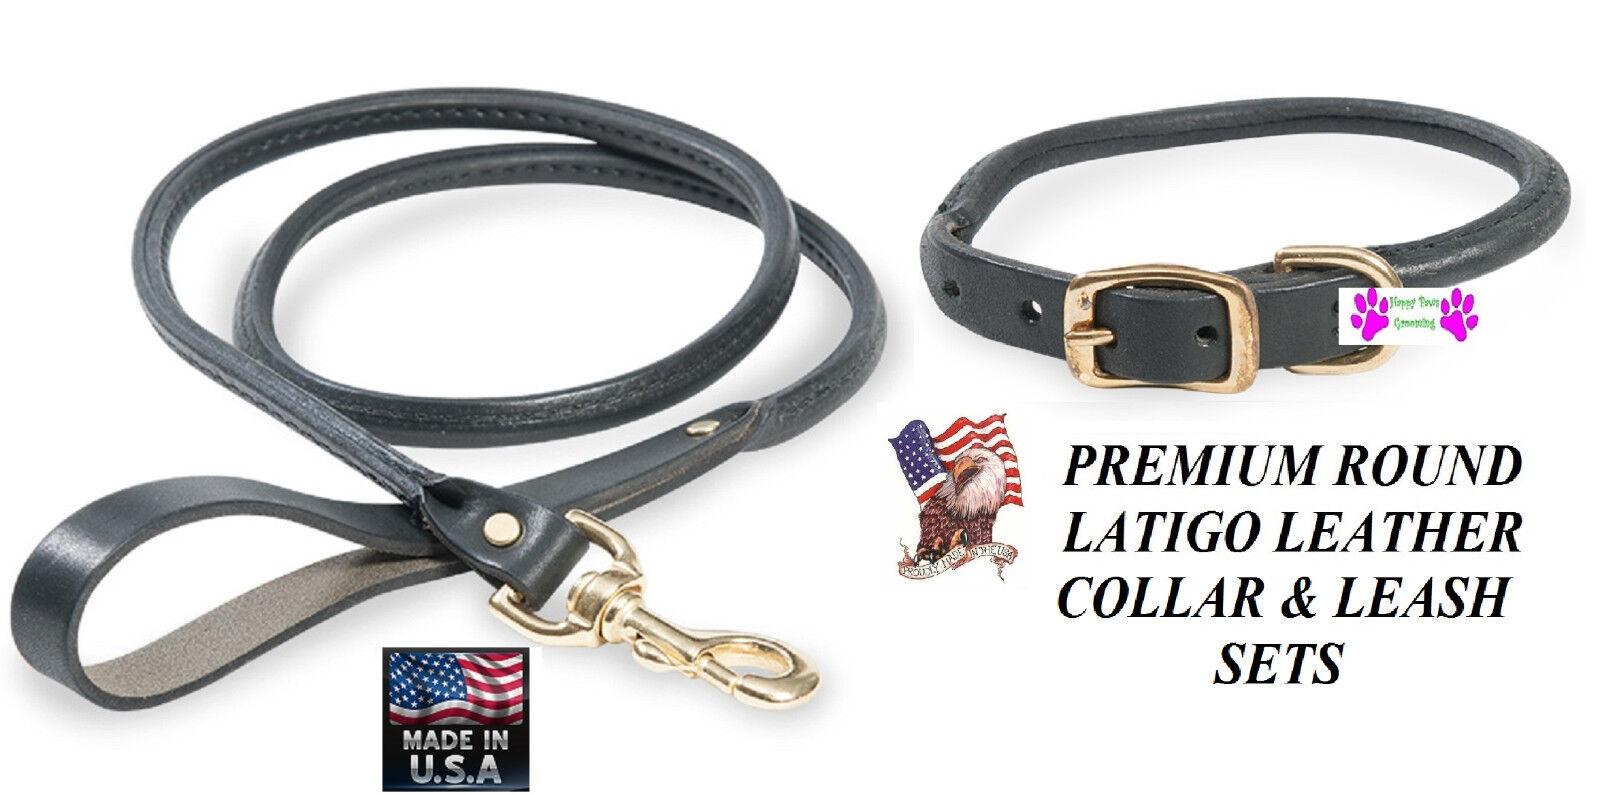 SET LATIGO LEATHER ROLLED ROUND Dog COLLAR&LEASHUSA MADEnero Brass Hardware